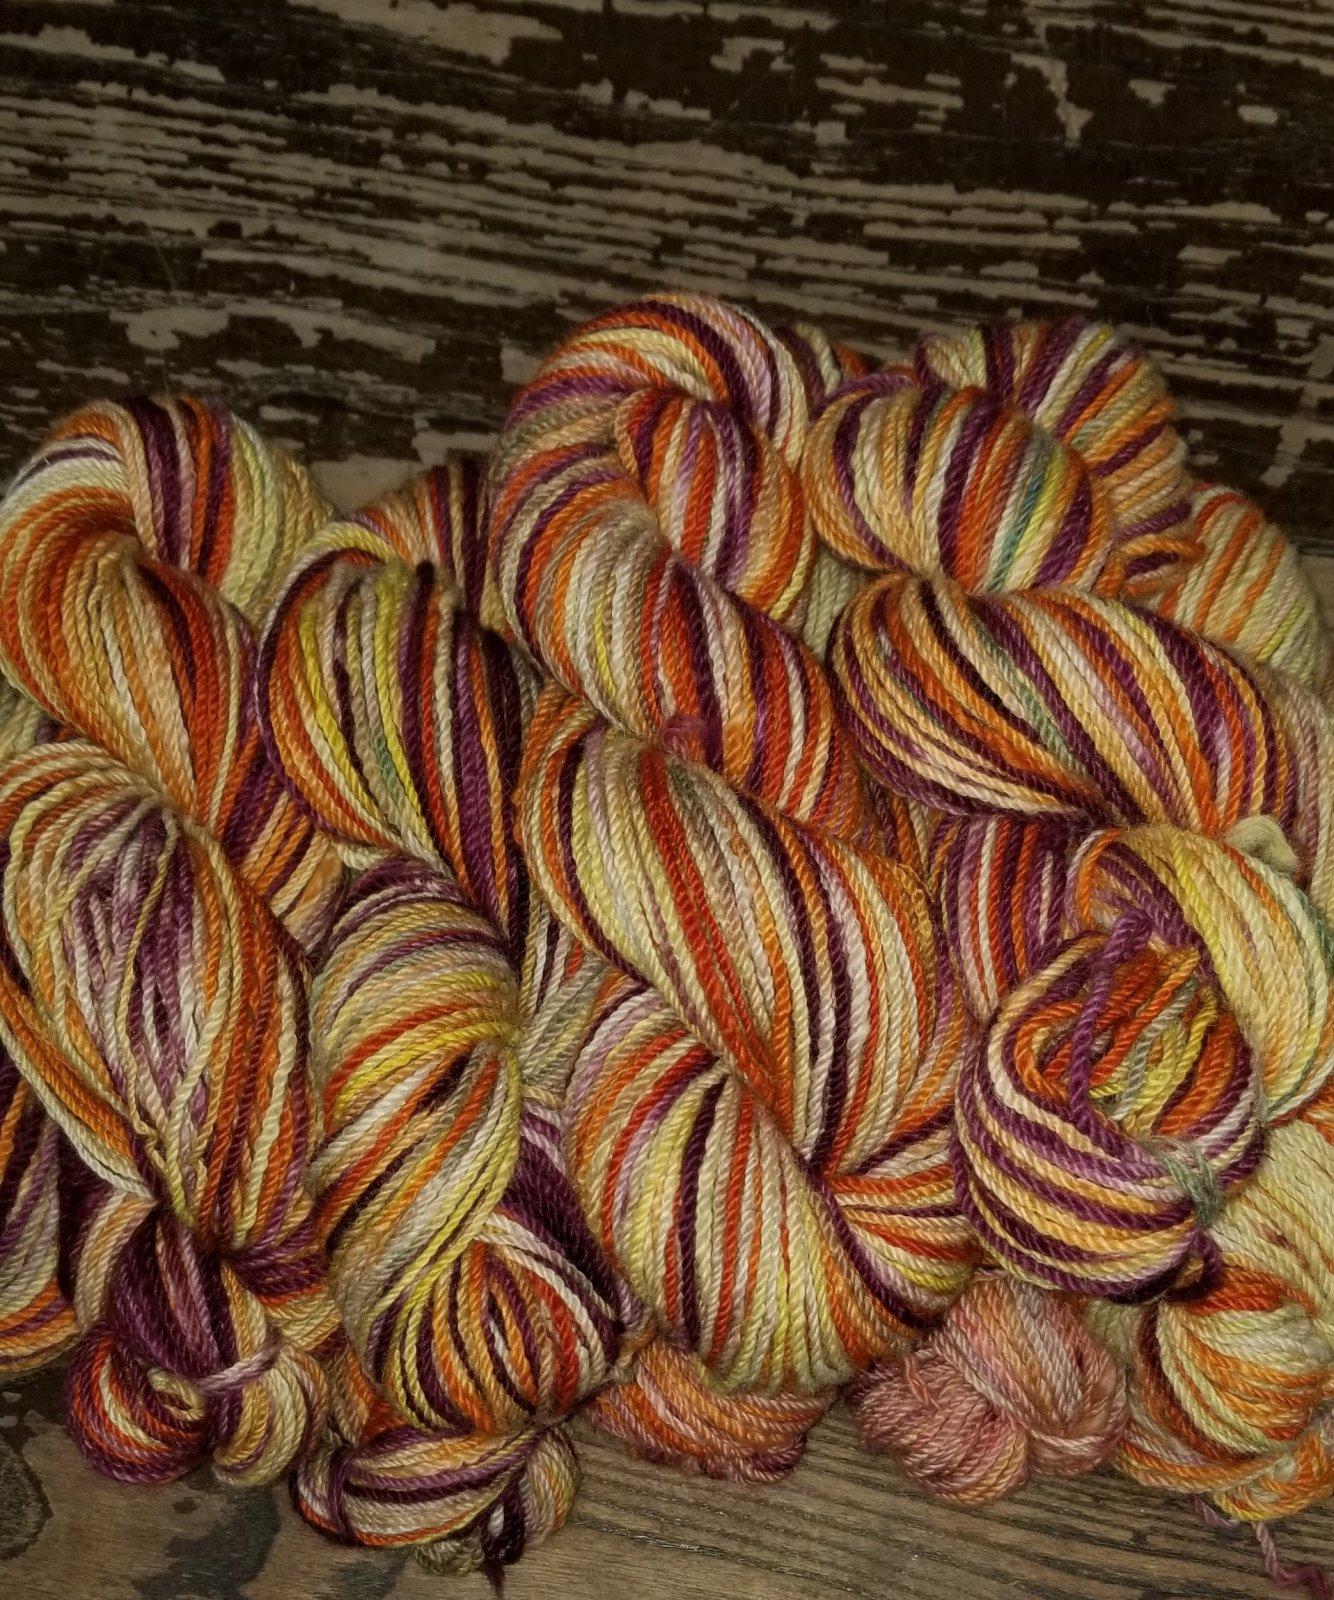 DK Weight Yarn - Dyed